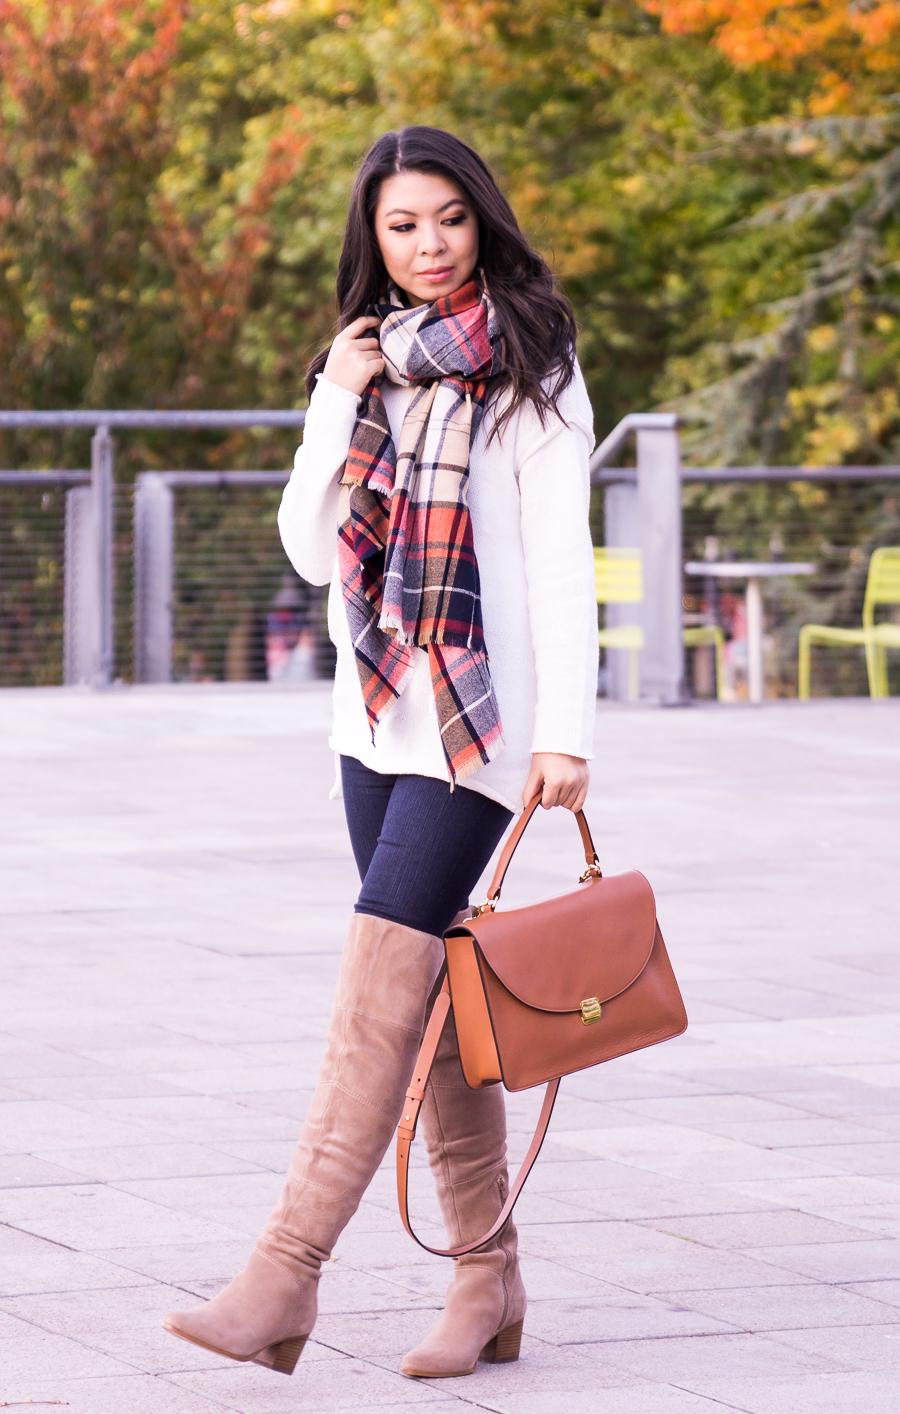 c381b7b5a6 Plaid scarf outfit